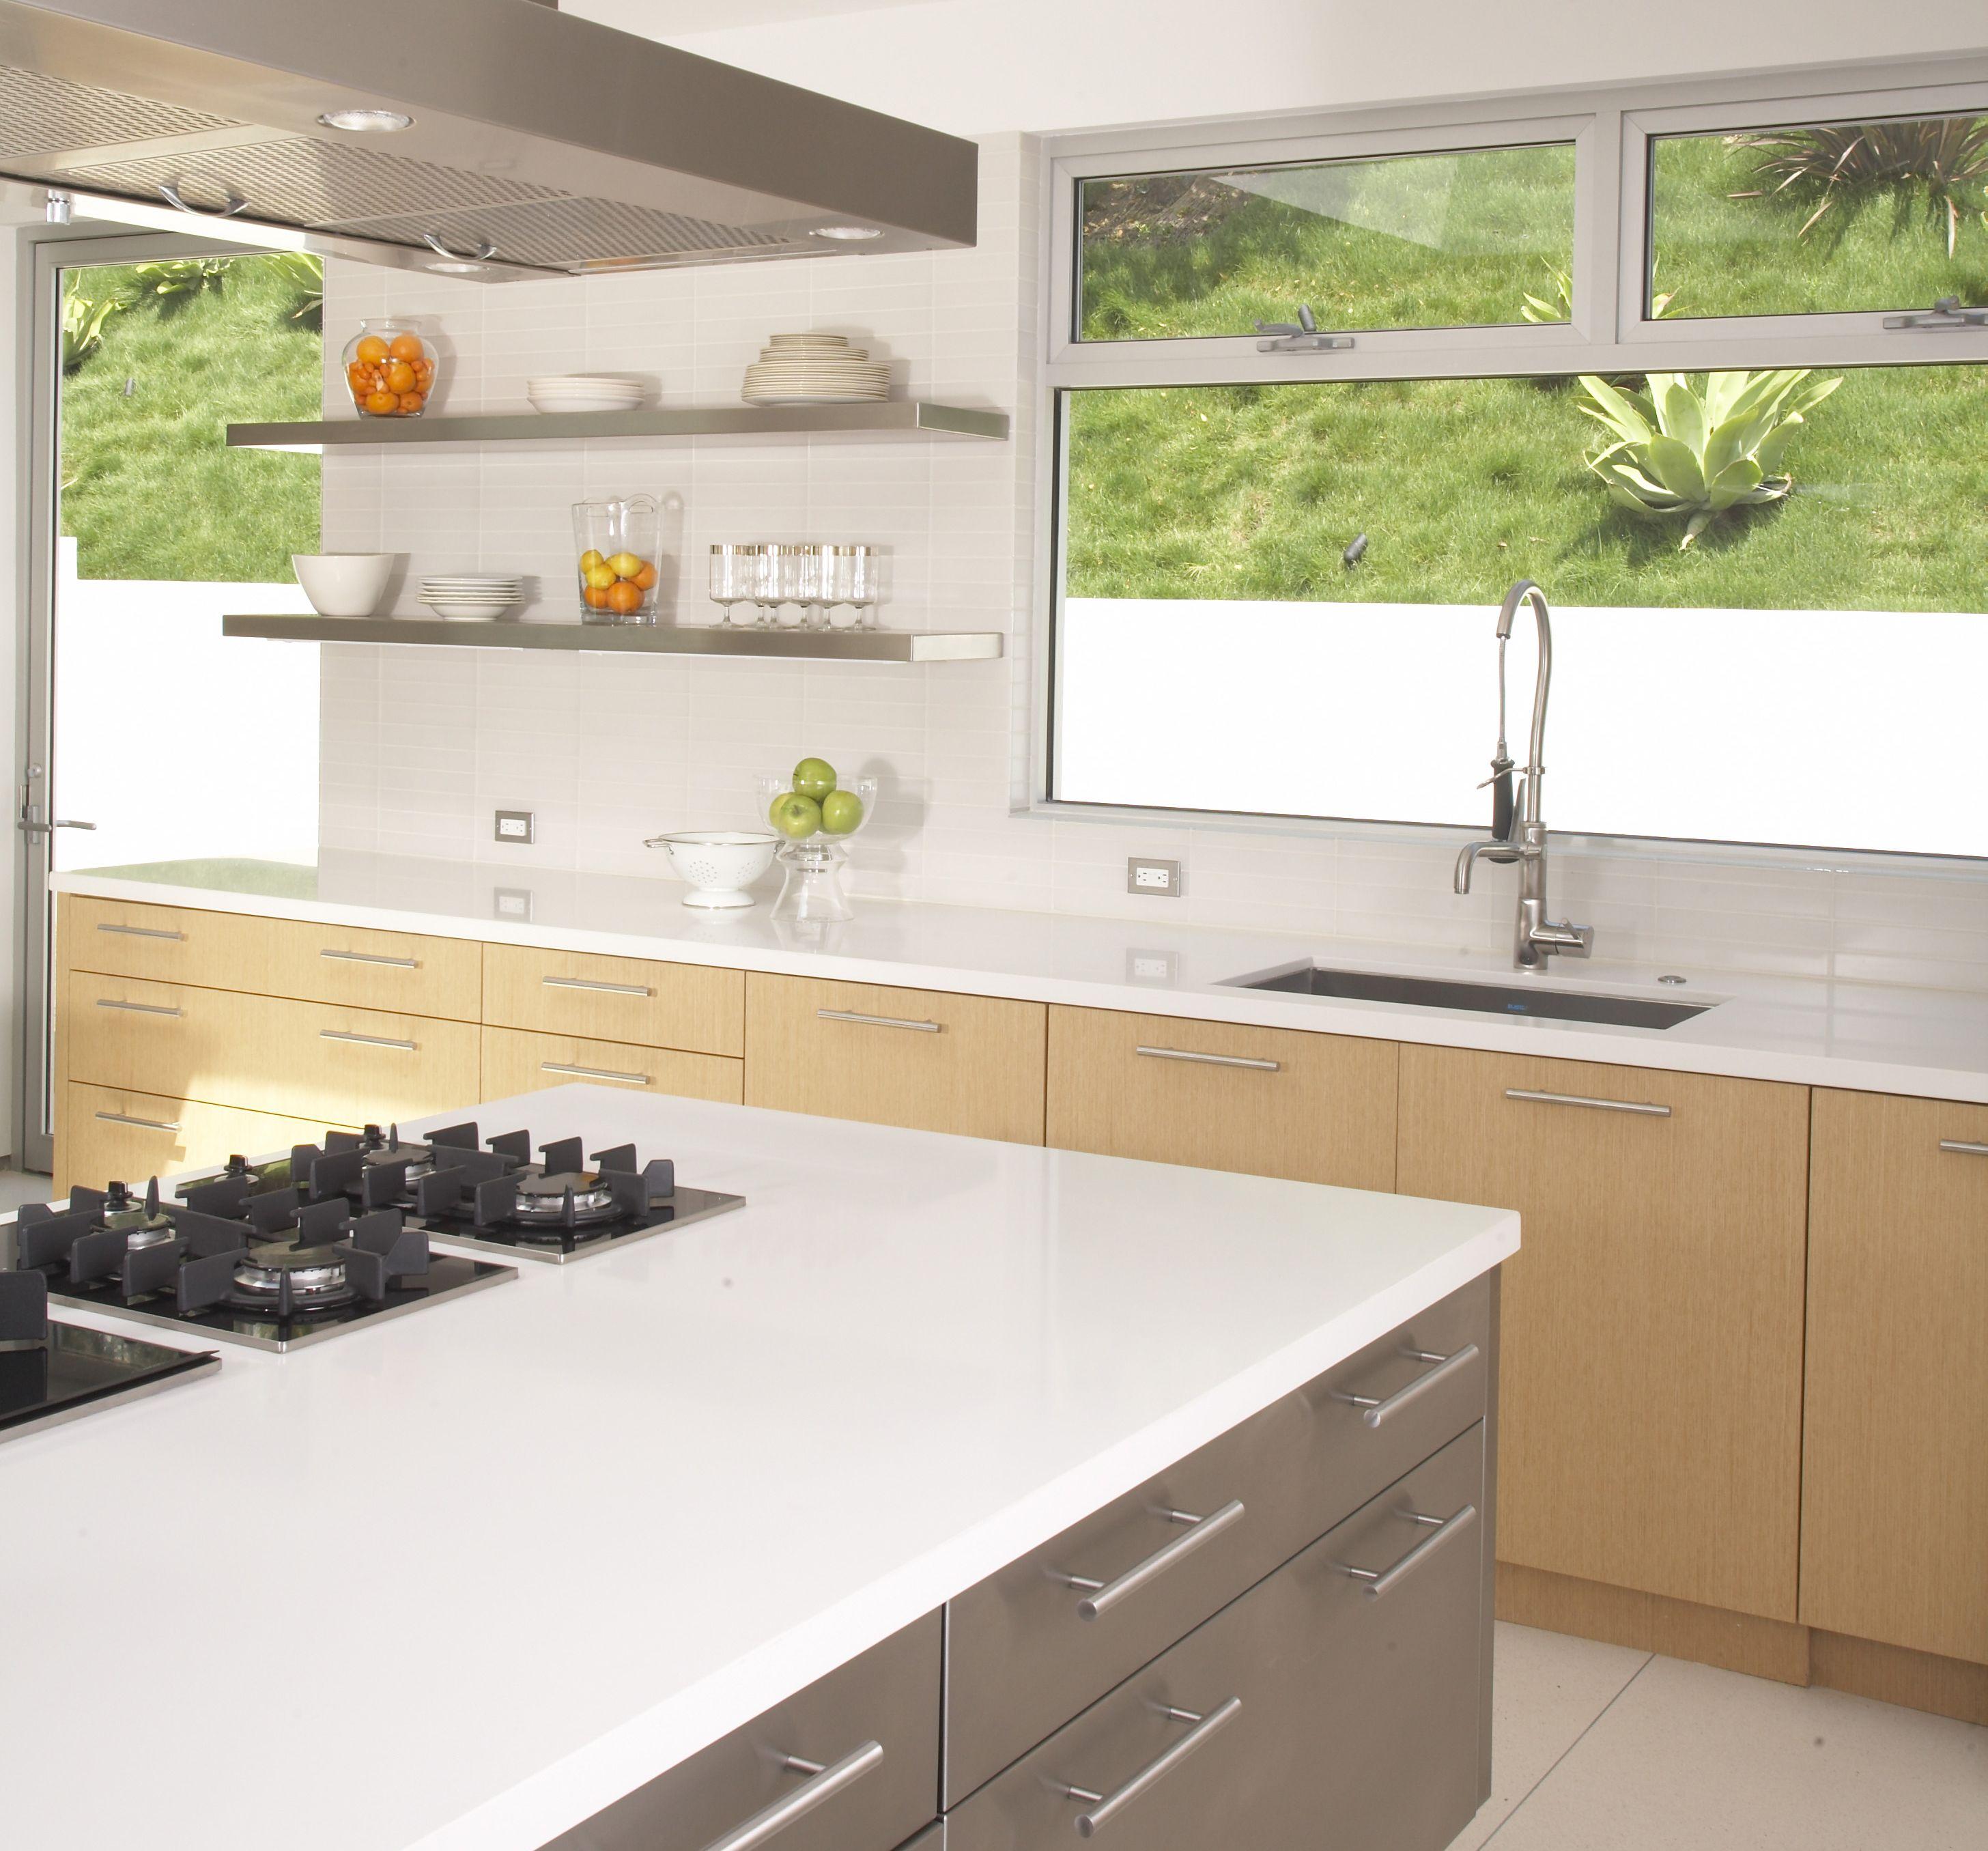 Caesarstone Blizzard Caesarstone Kitchen Caesarstone Countertop Modern Kitchen